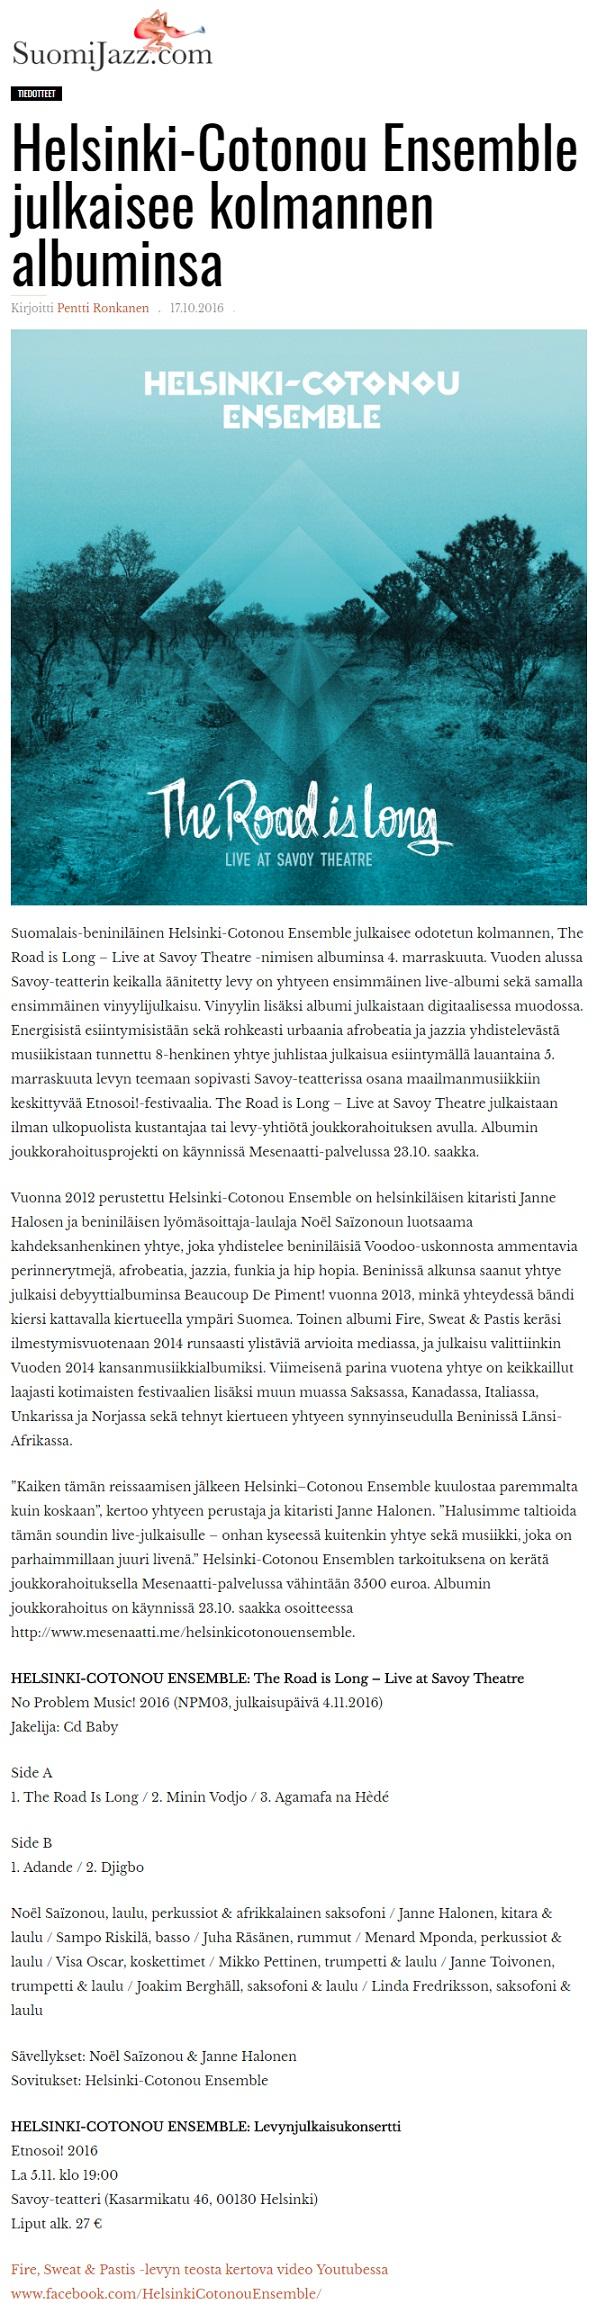 SuomiJazz.com (Finland) 17.10.2016